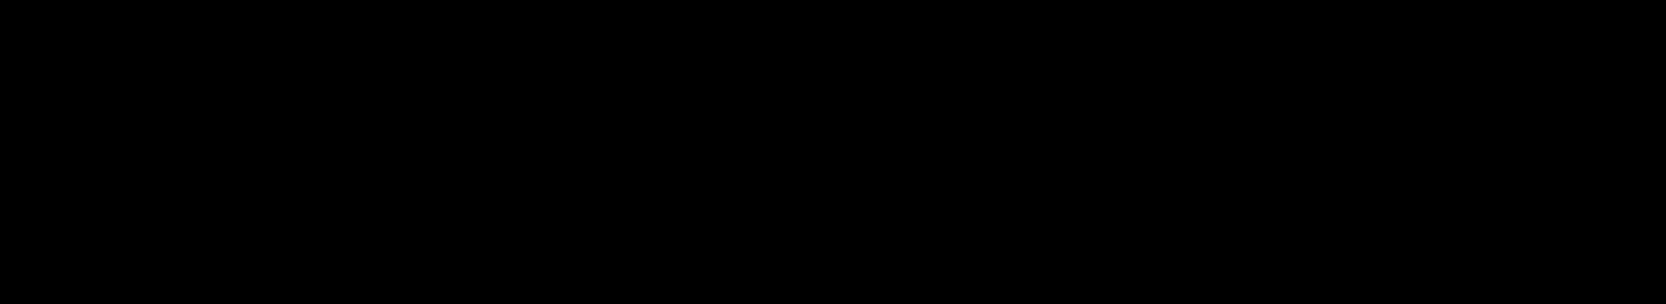 Brevitē